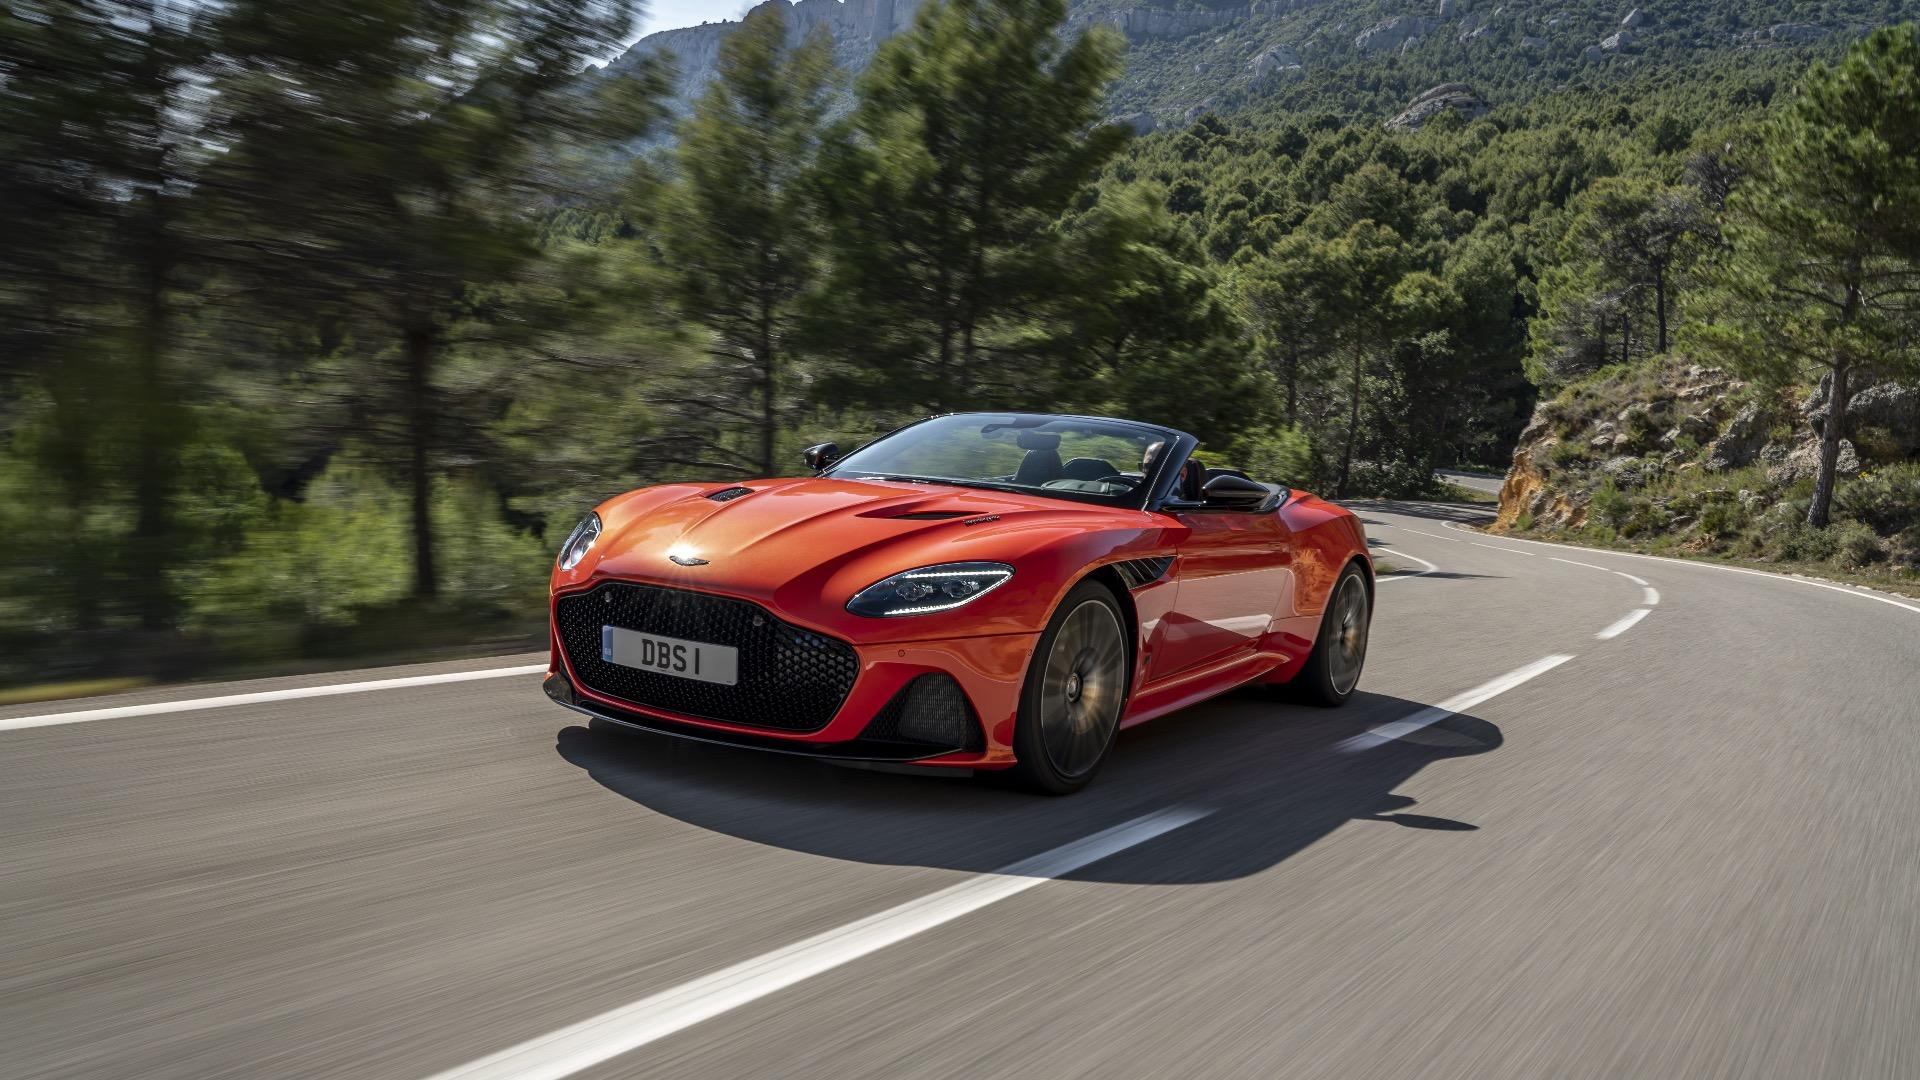 2019 Aston Martin Dbs Superleggera Volante Review Sensory Overload